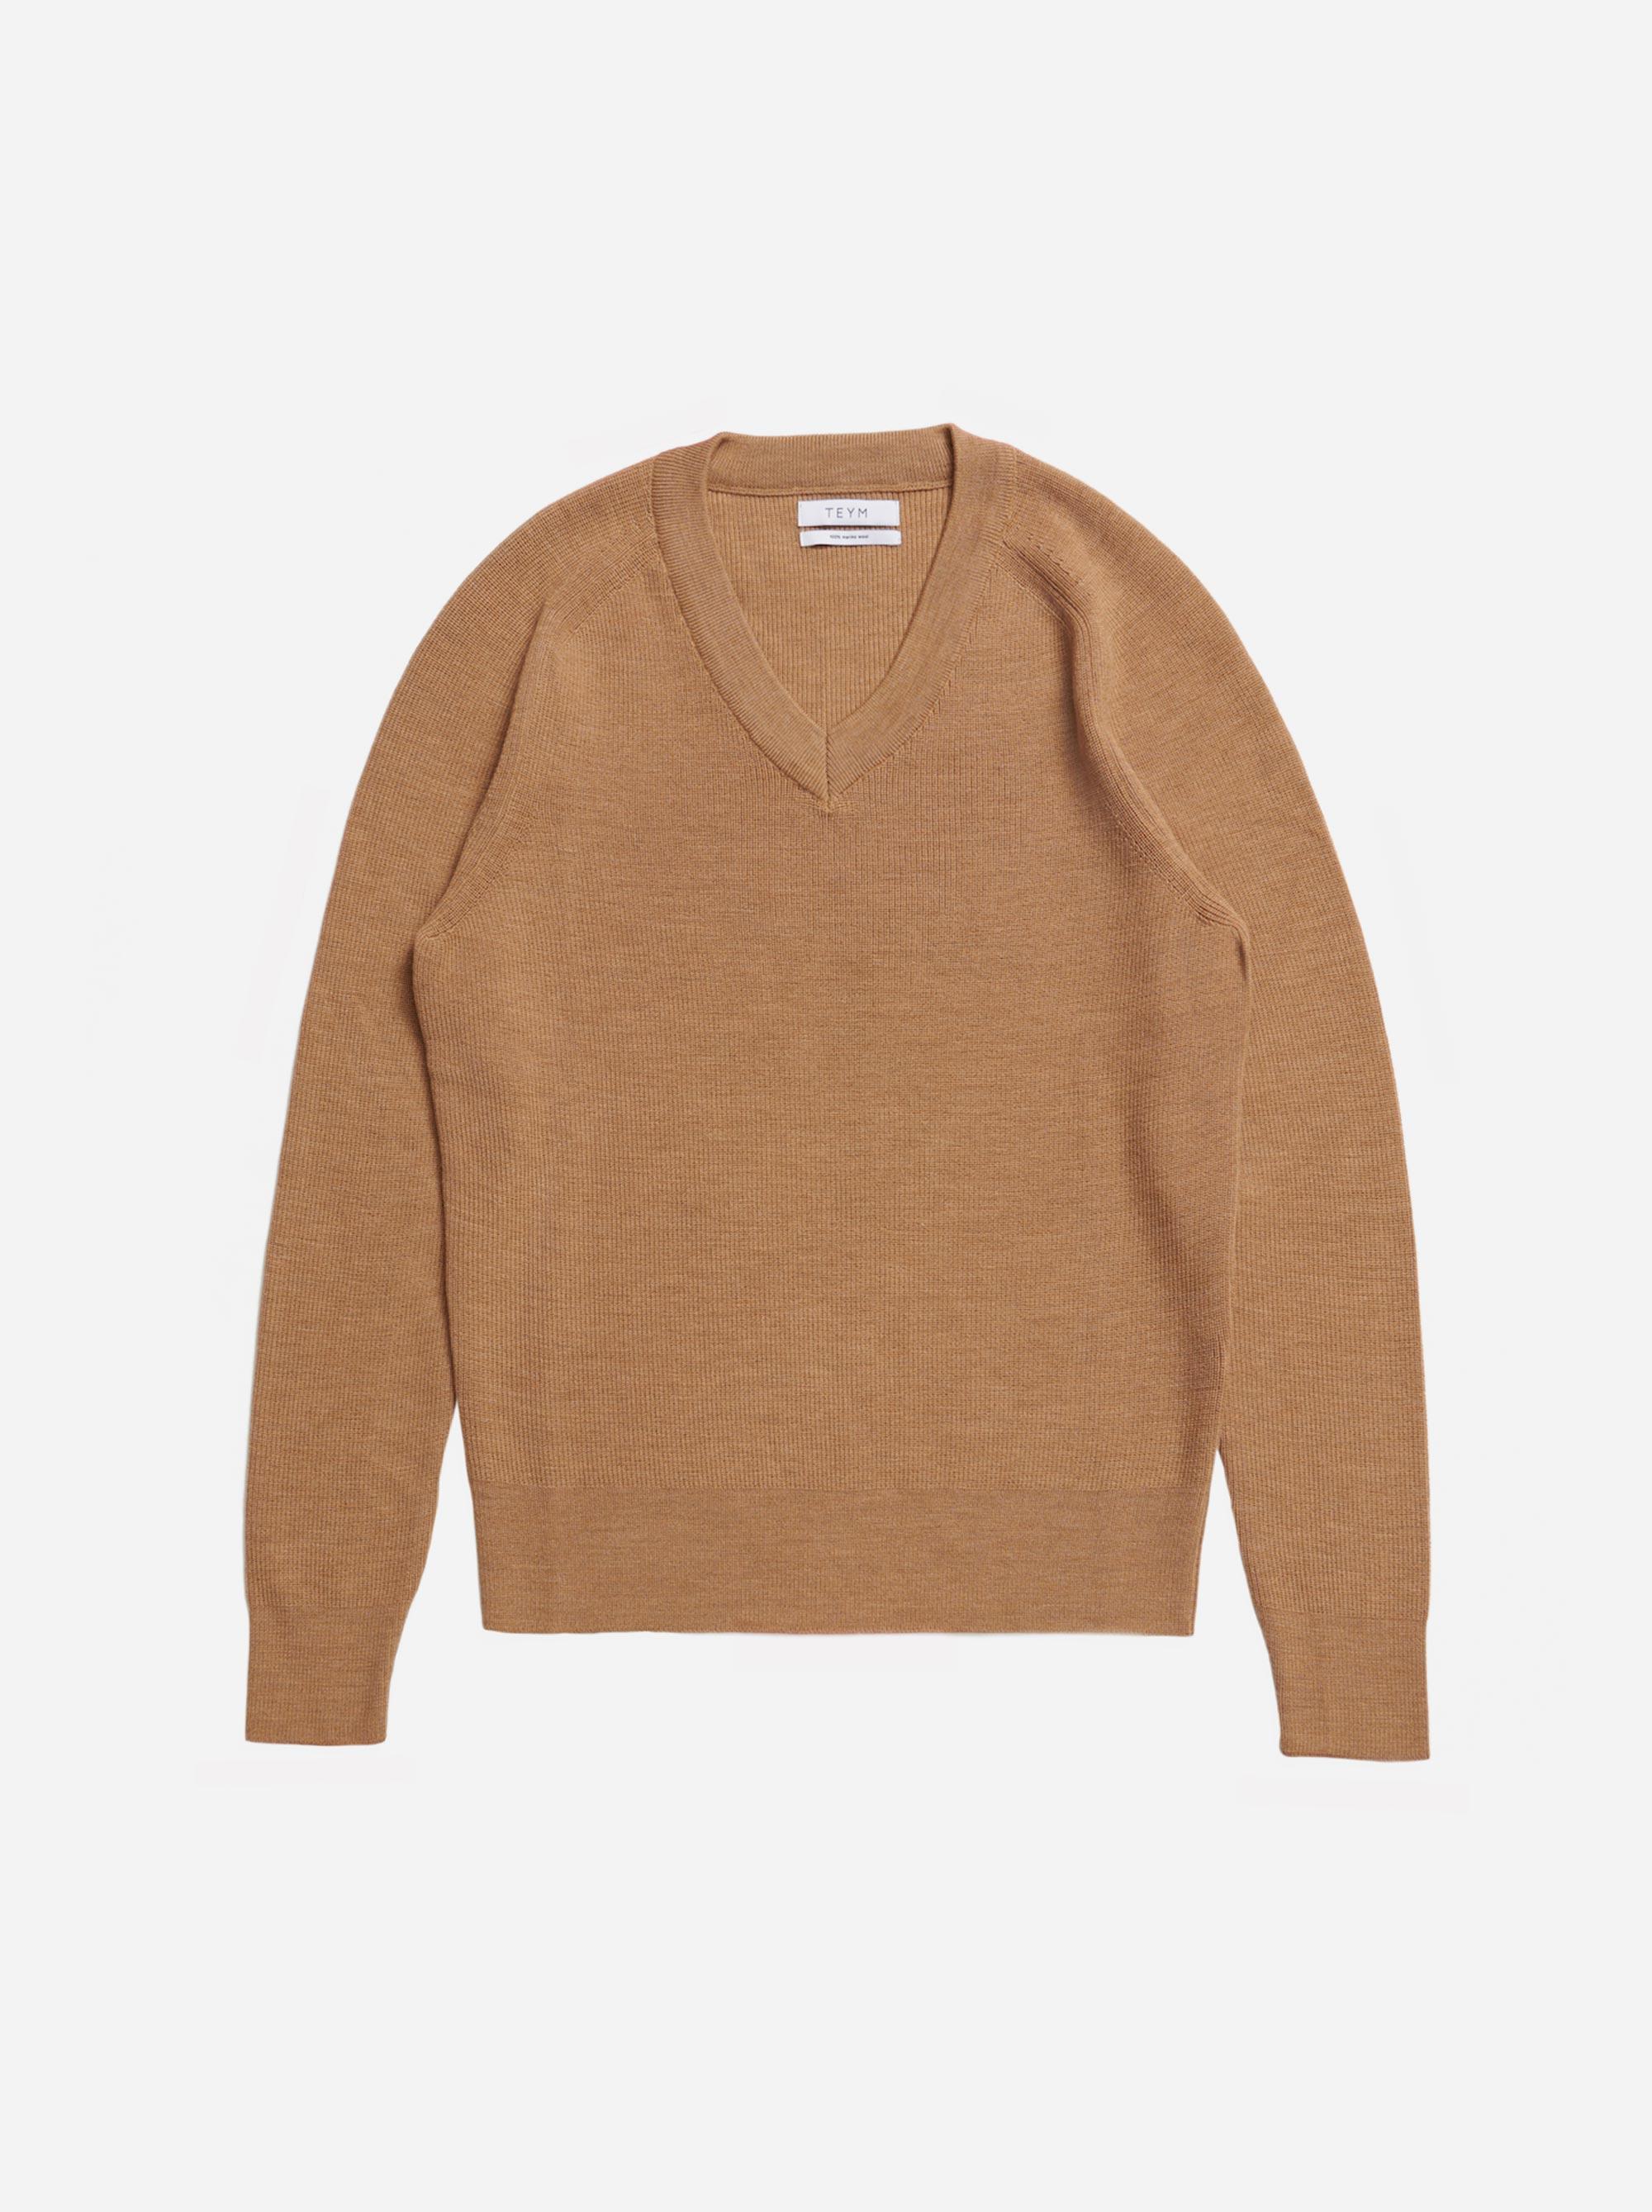 Teym - V-Neck - The Merino Sweater - Men - Camel - 4